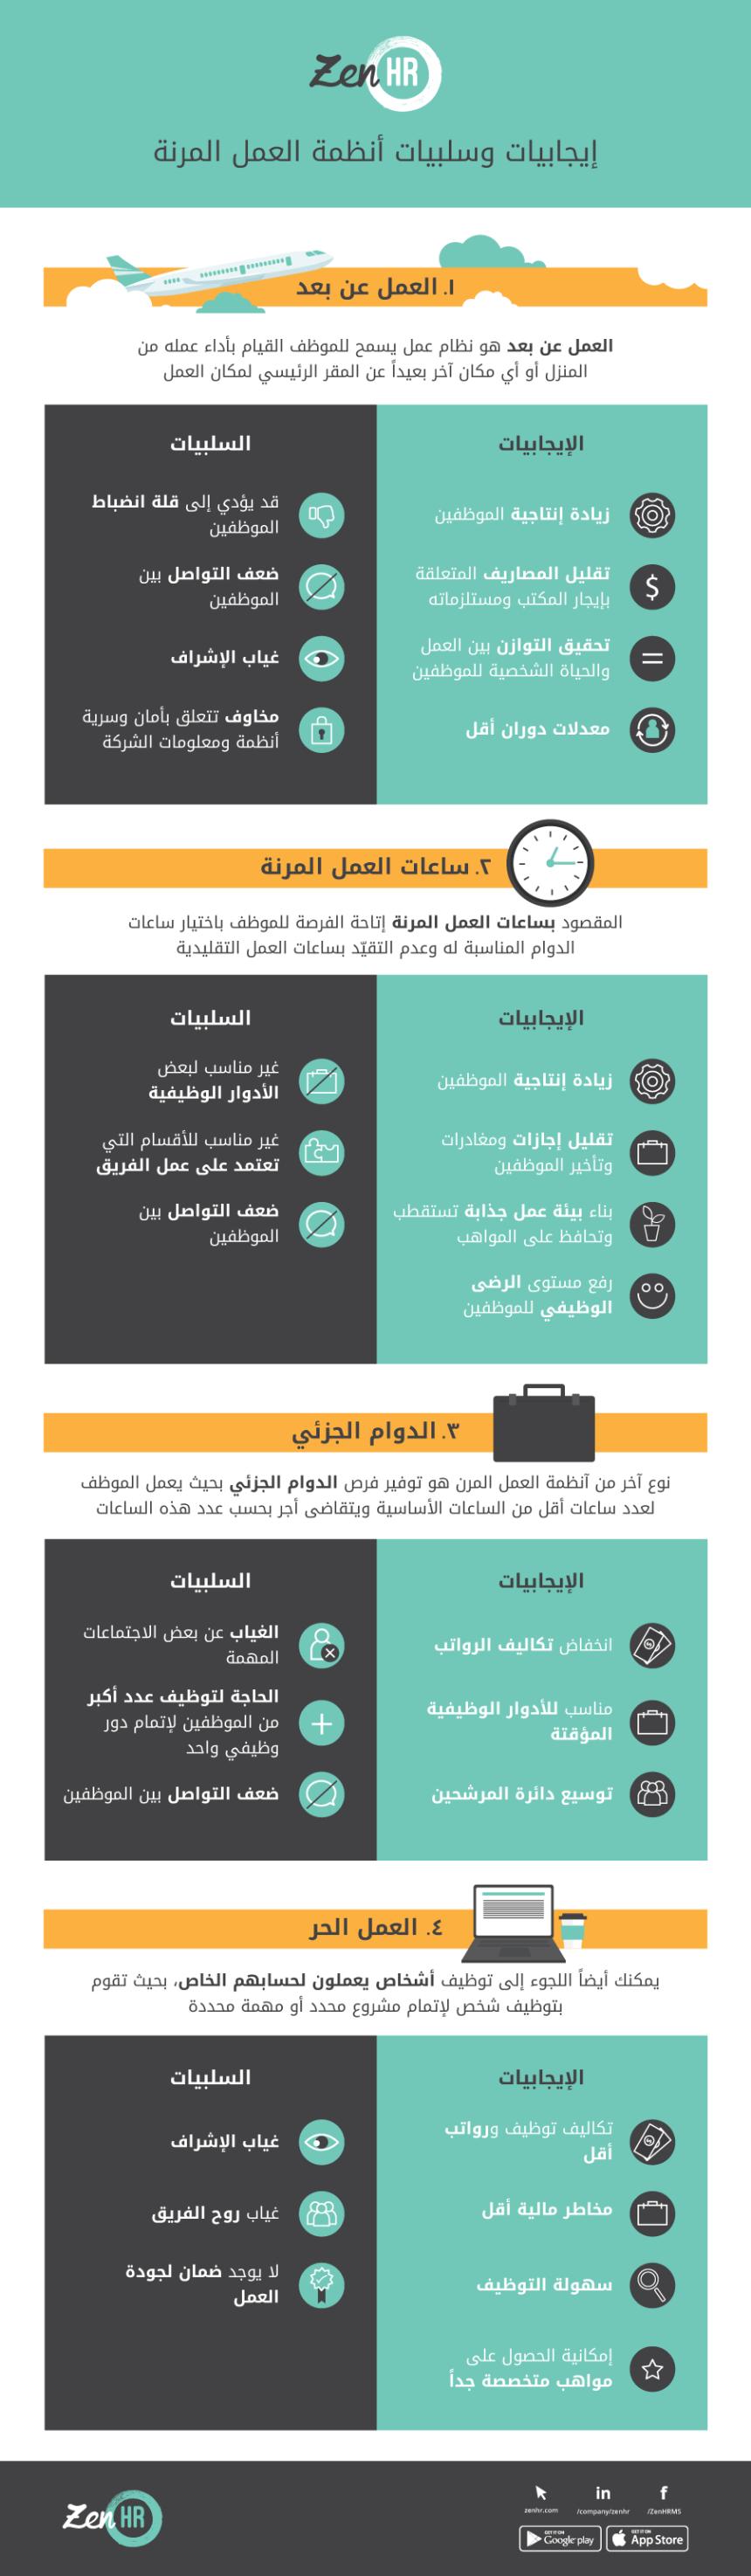 zenhr-infographic_prosandcons